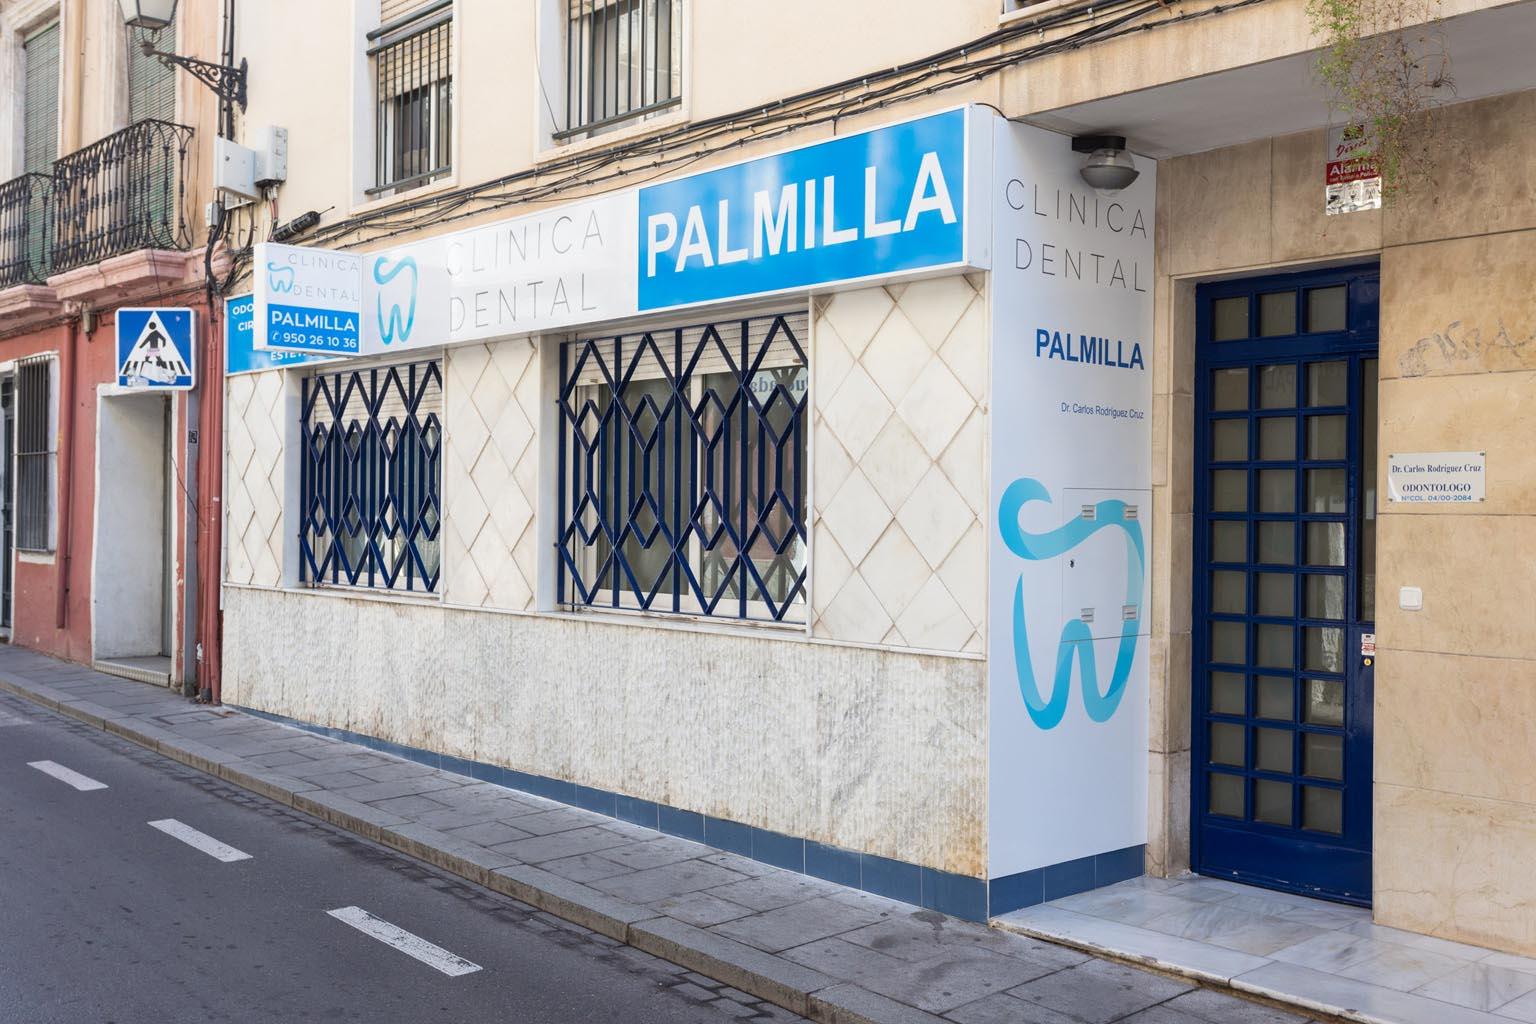 Clínica dental en Almería - Clínica Dental Palmilla en calle Real de Almería